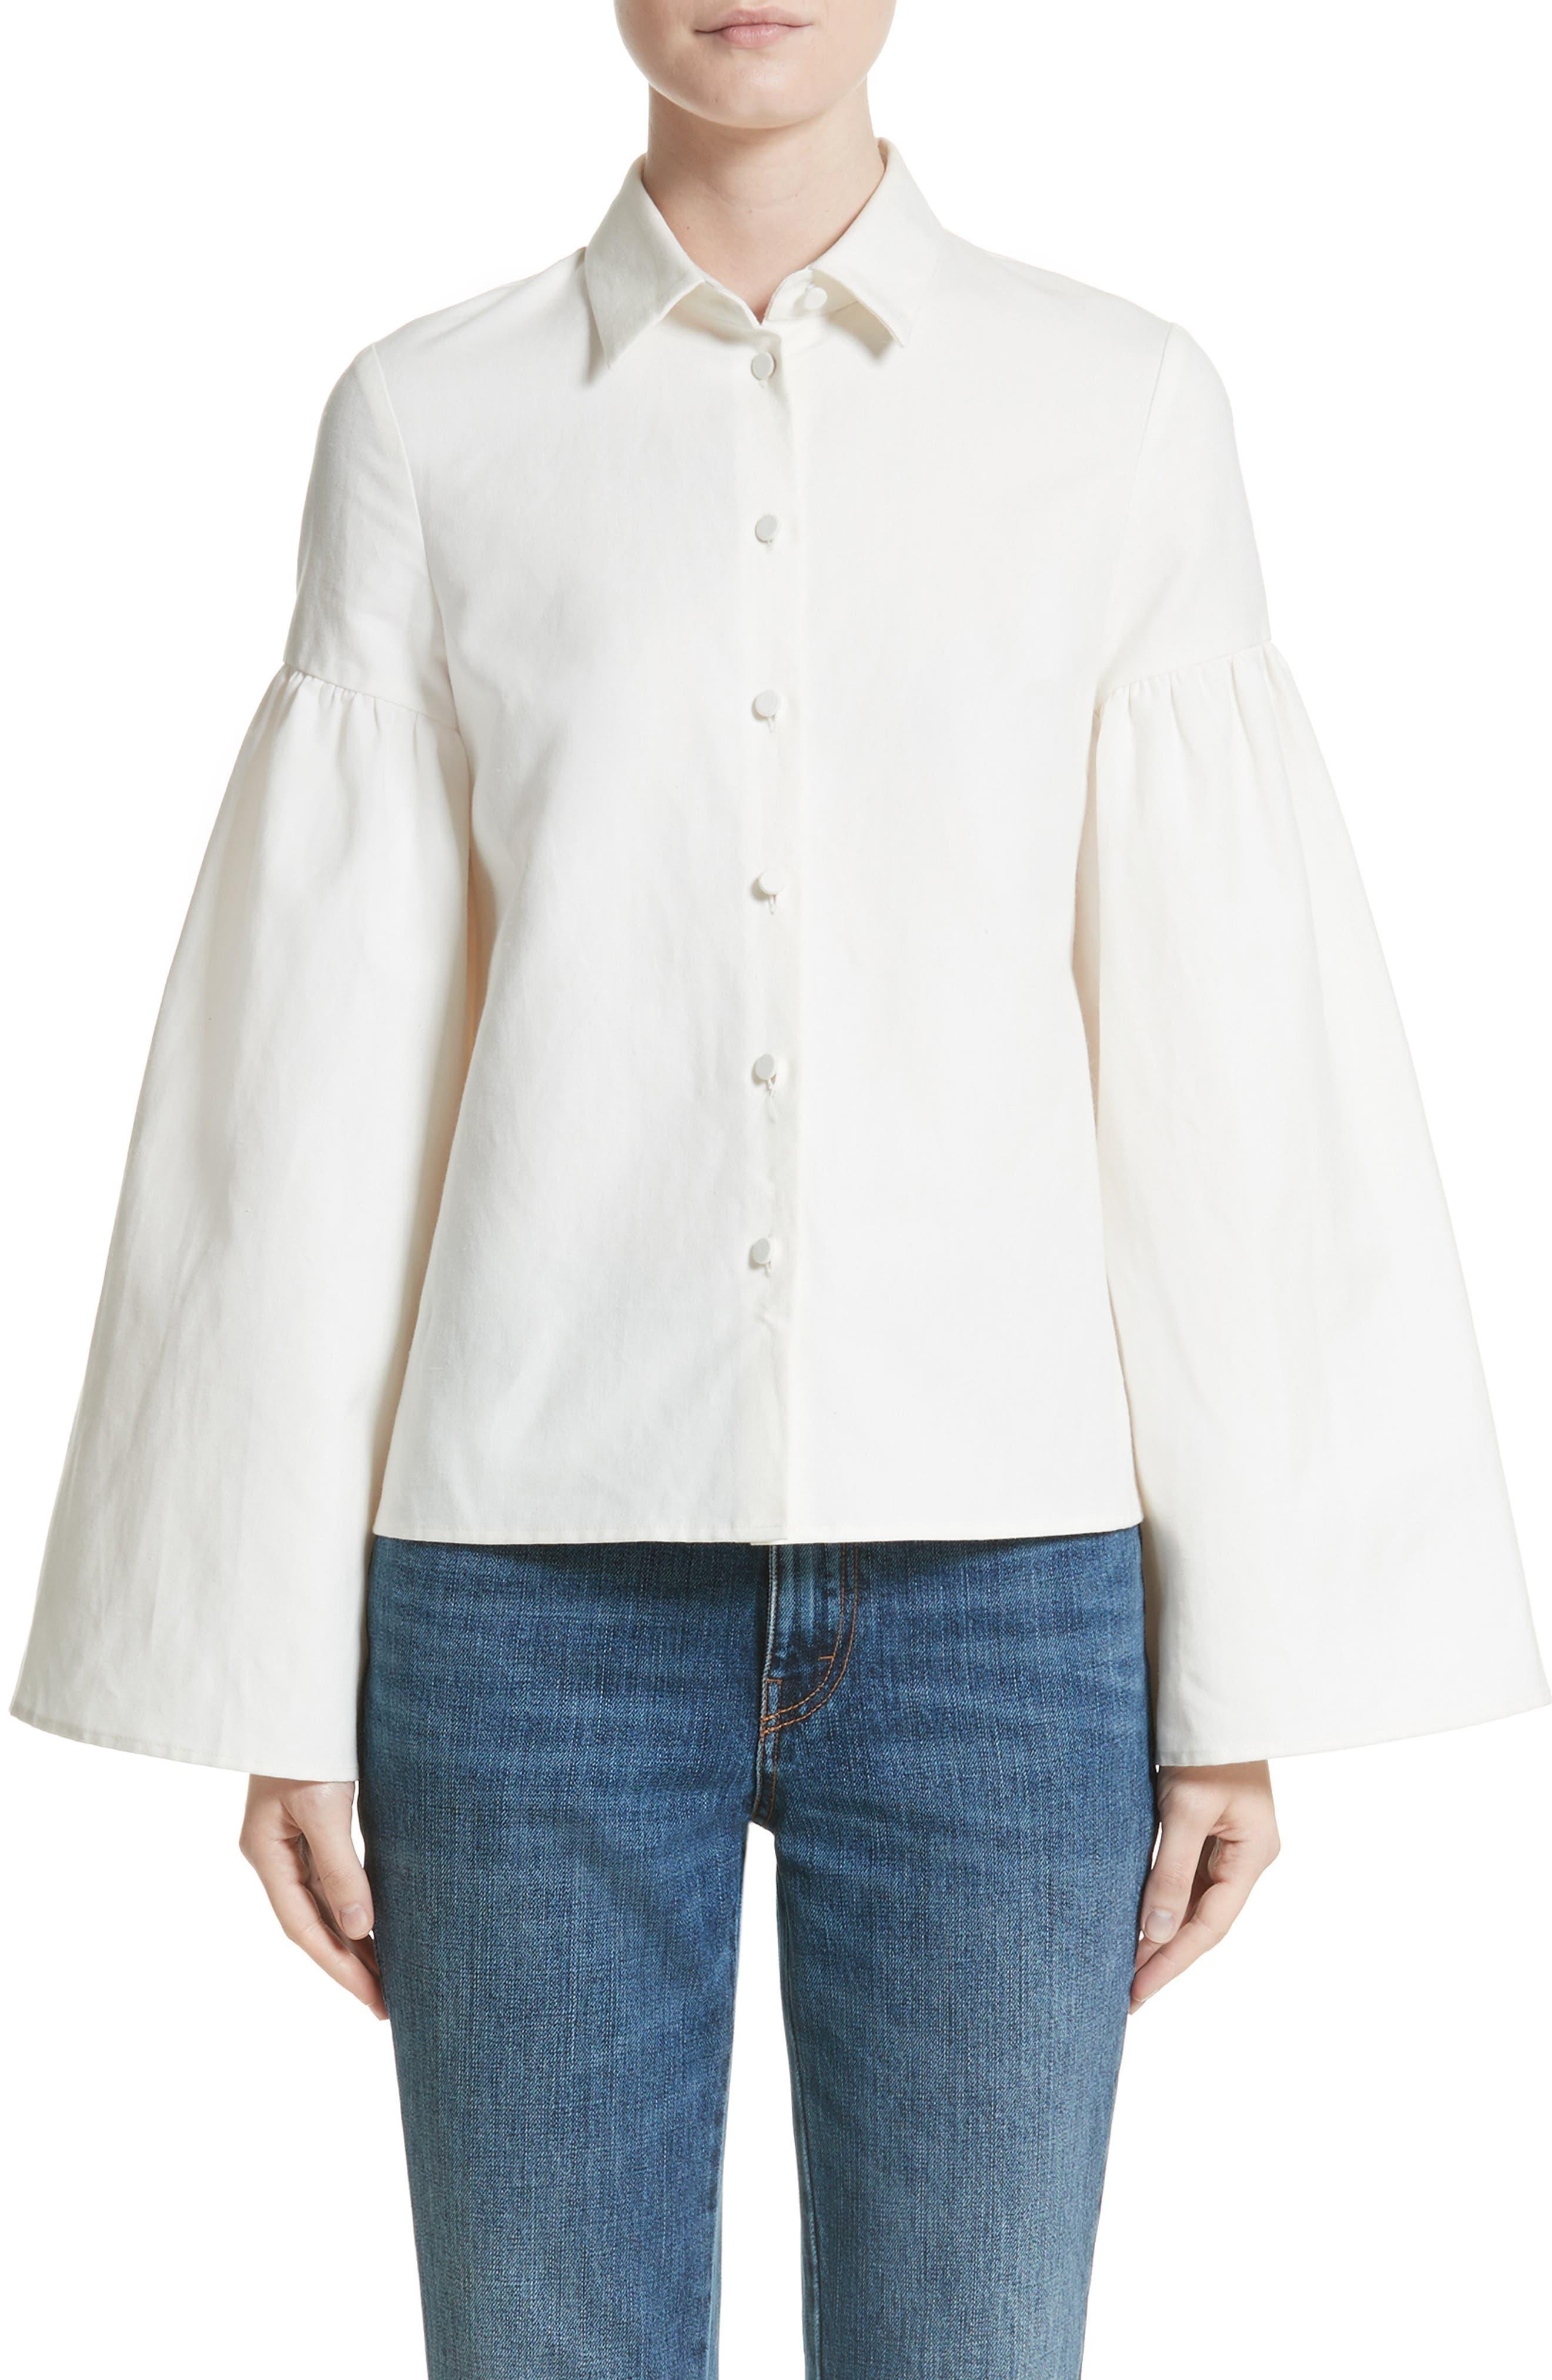 Co Linen & Cotton Puff Sleeve Top